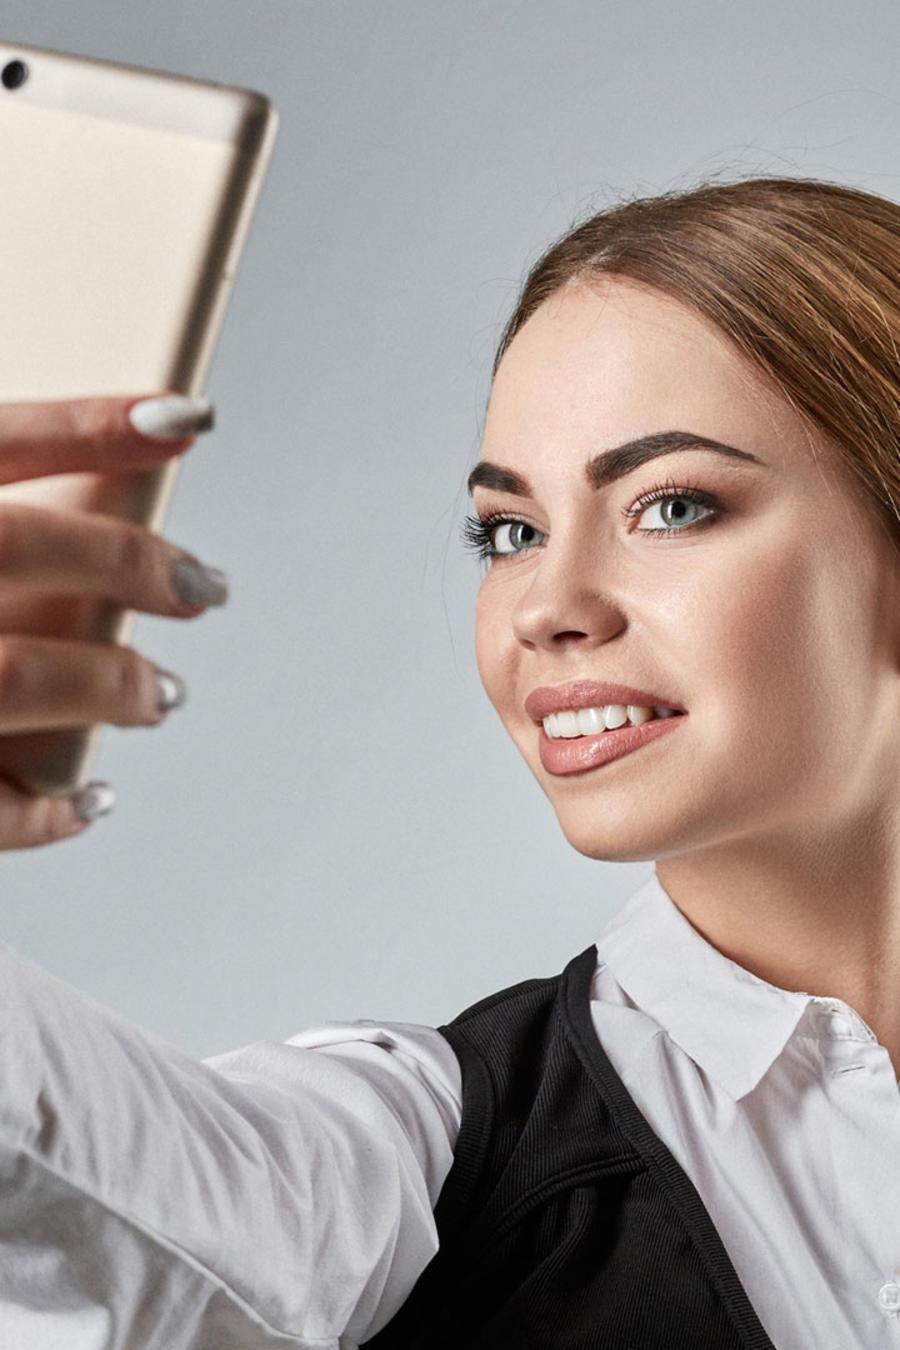 Mujer ejecutiva se toma una selfie